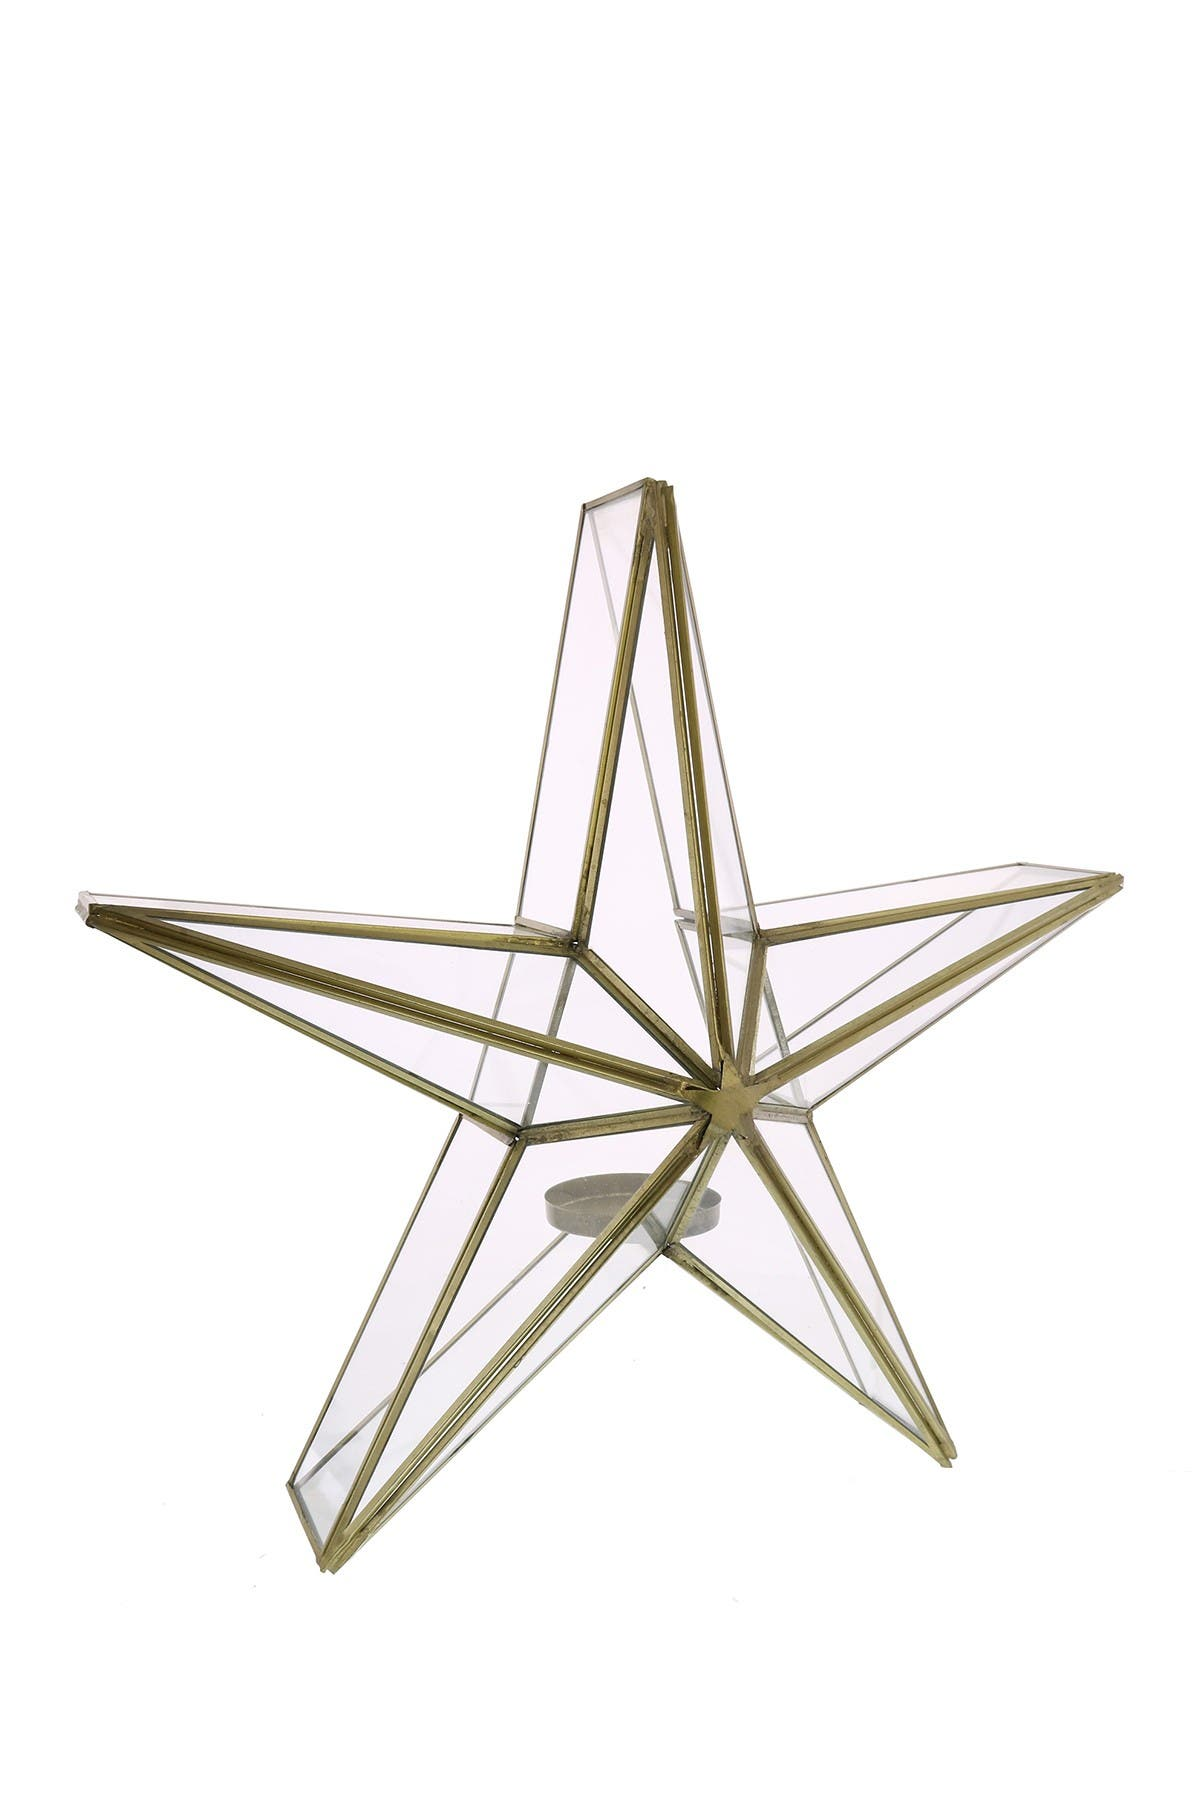 Image of HOMART Glass Star Candle Holder - Large